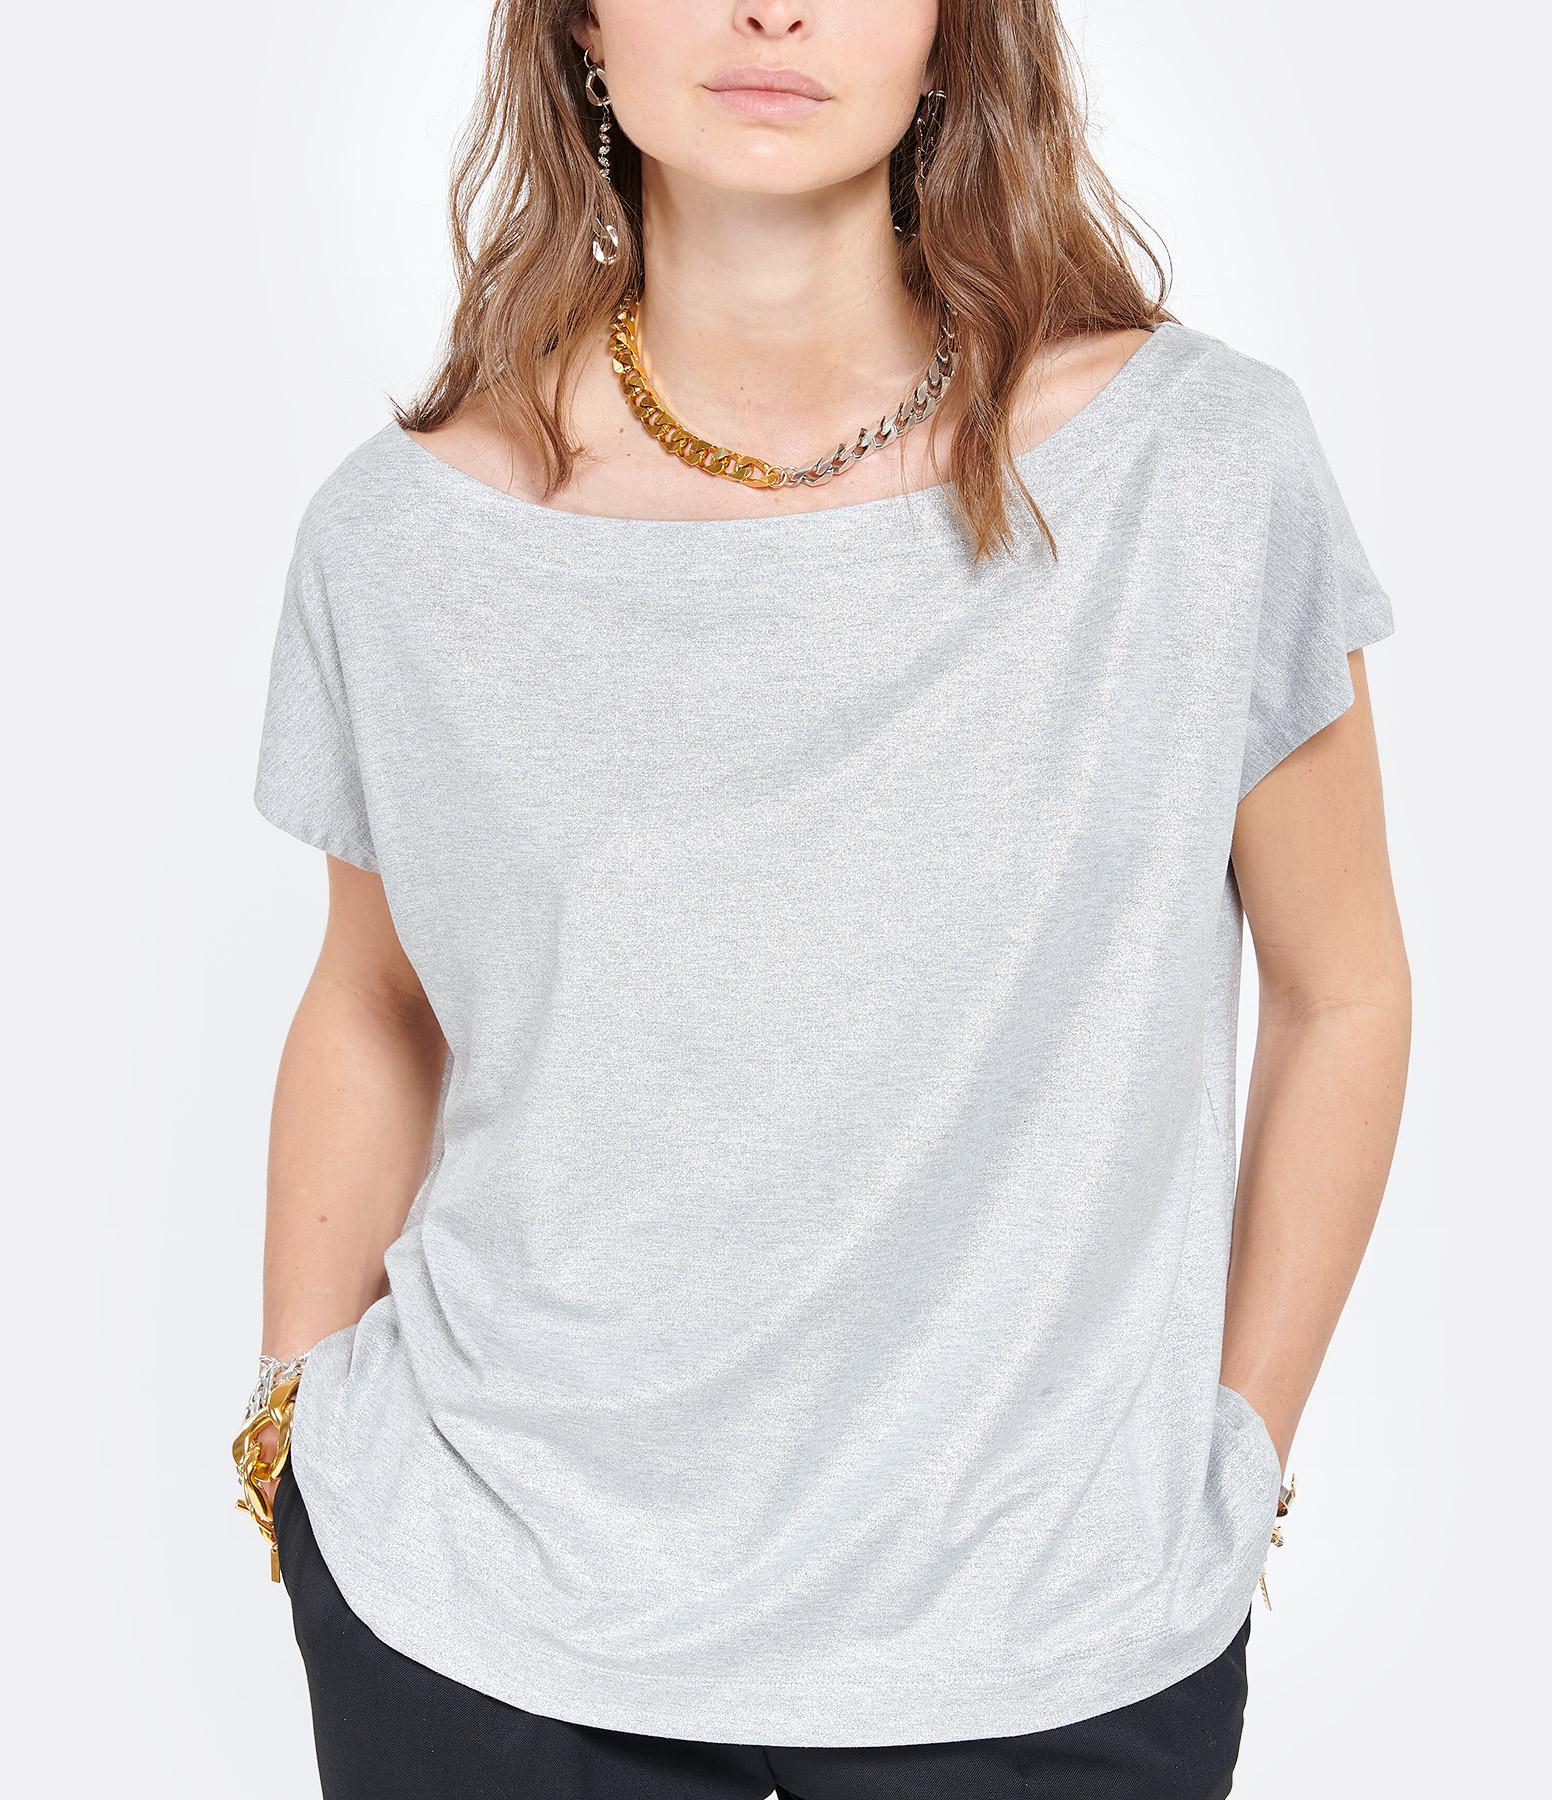 MAJESTIC FILATURES - Tee-shirt Col Bateau Gris Métallisé